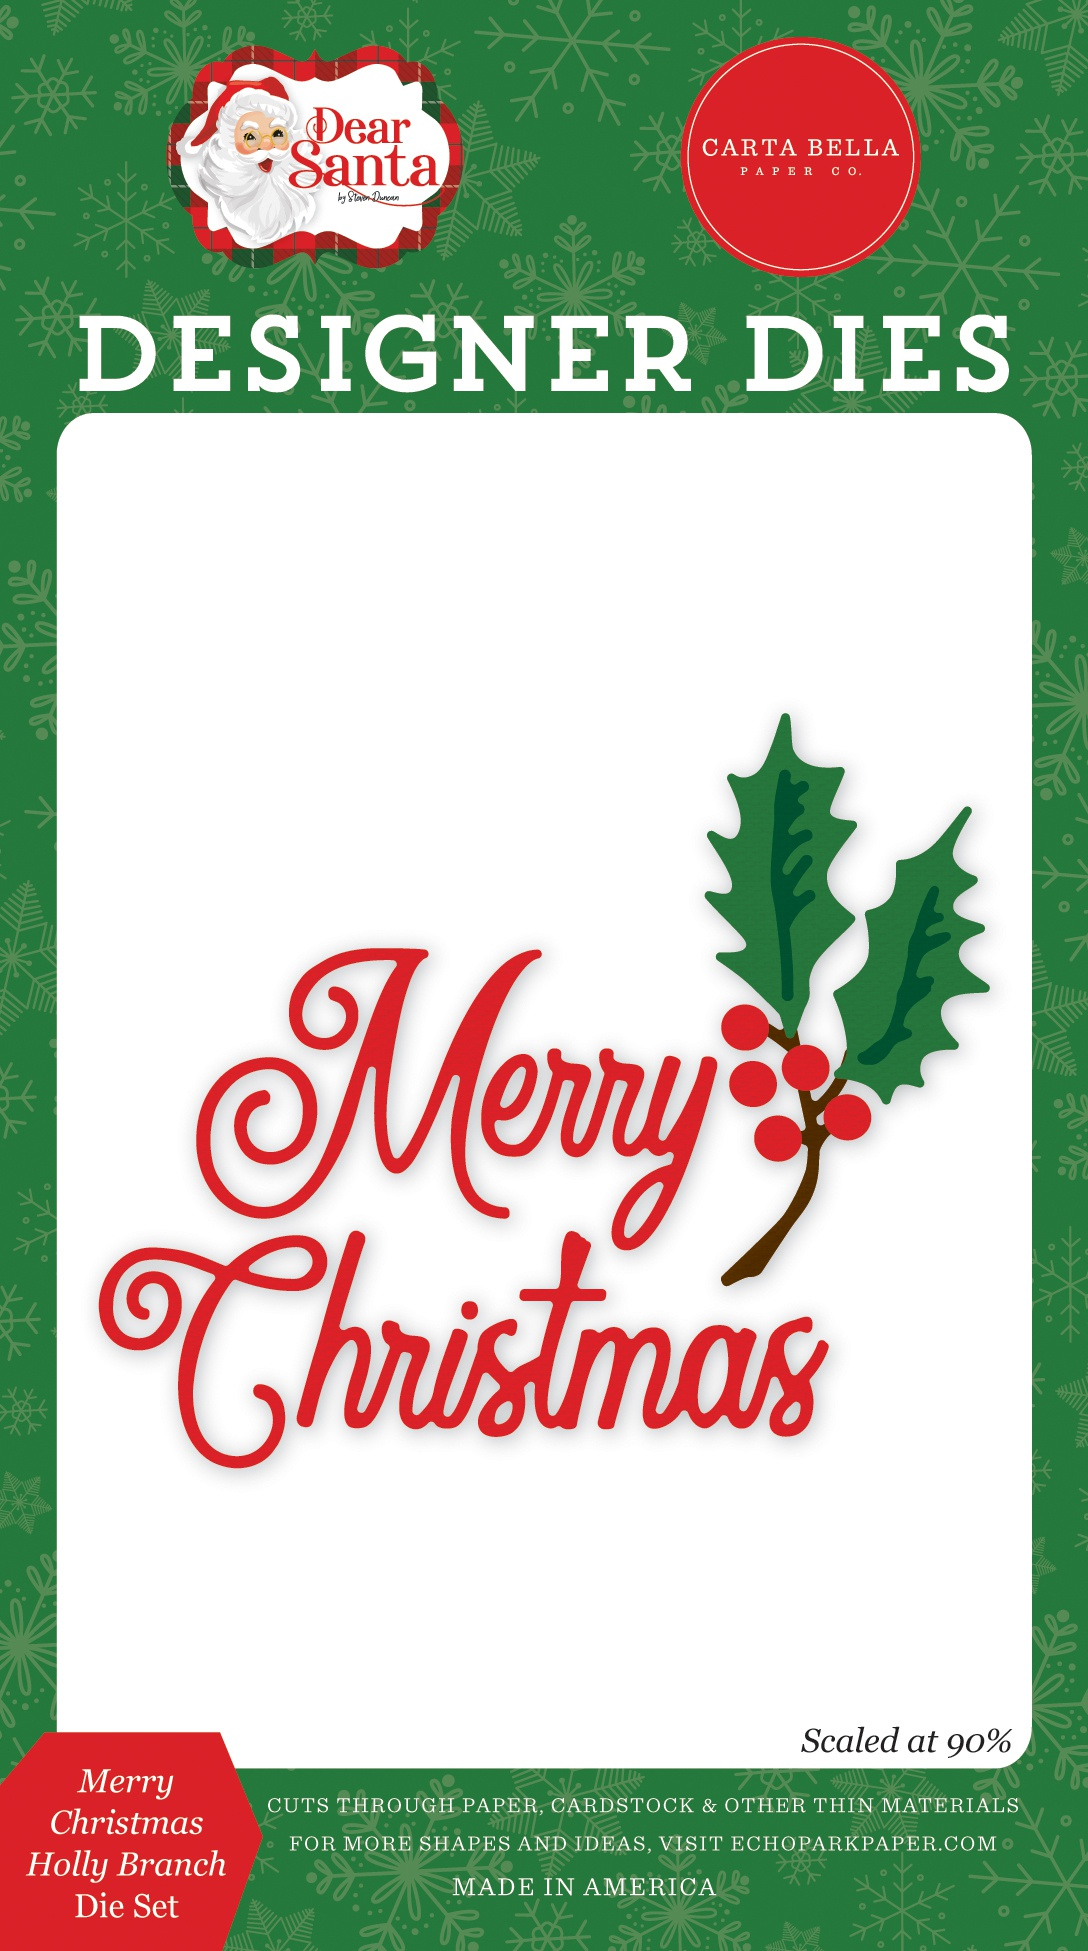 Carte Bella Dear Santa Dies- Merry Christmas Holly Branch